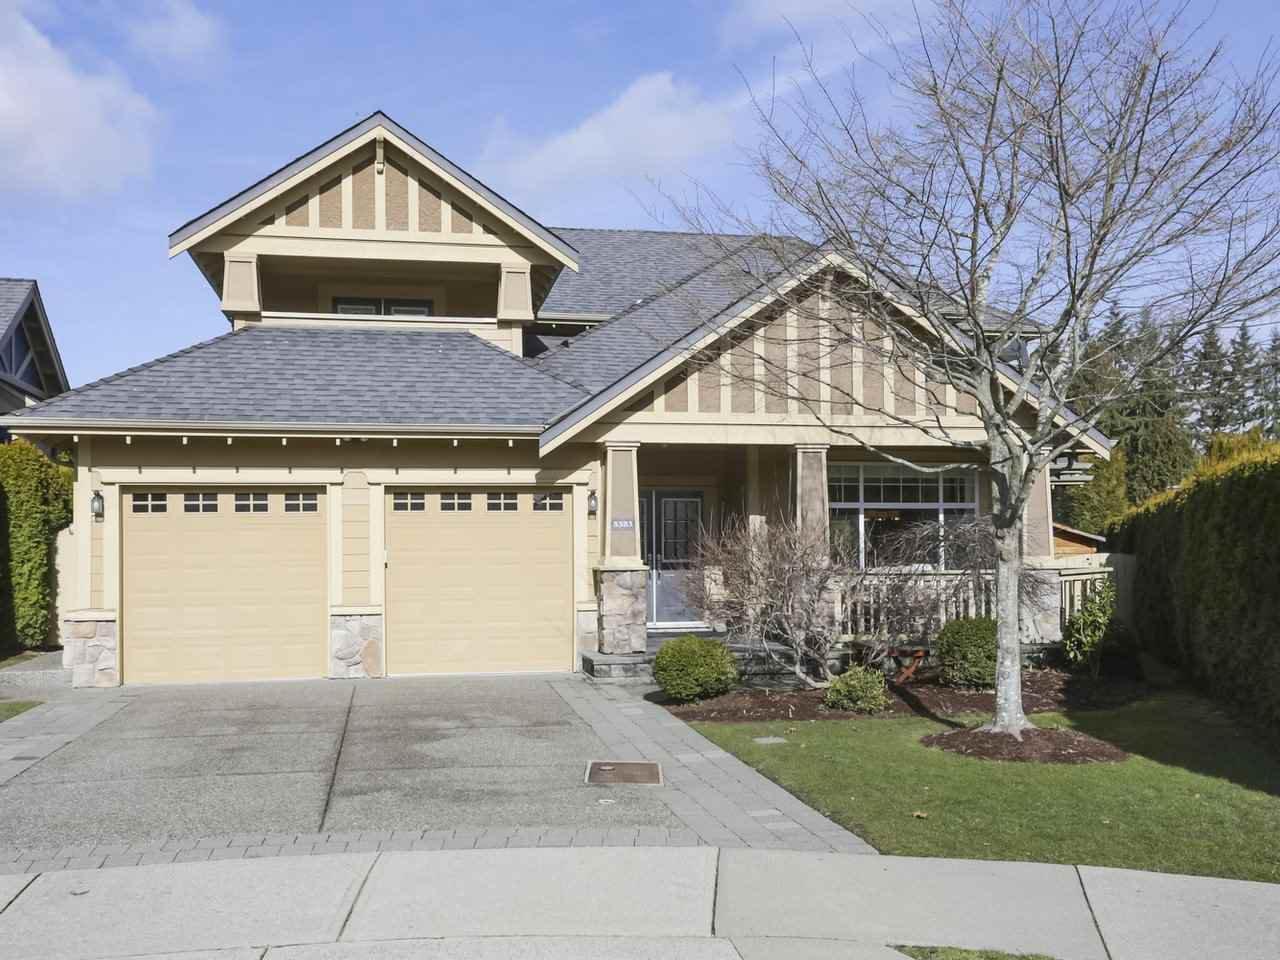 Main Photo: 5383 SPETIFORE Crescent in Delta: Tsawwassen Central House for sale (Tsawwassen)  : MLS®# R2439998